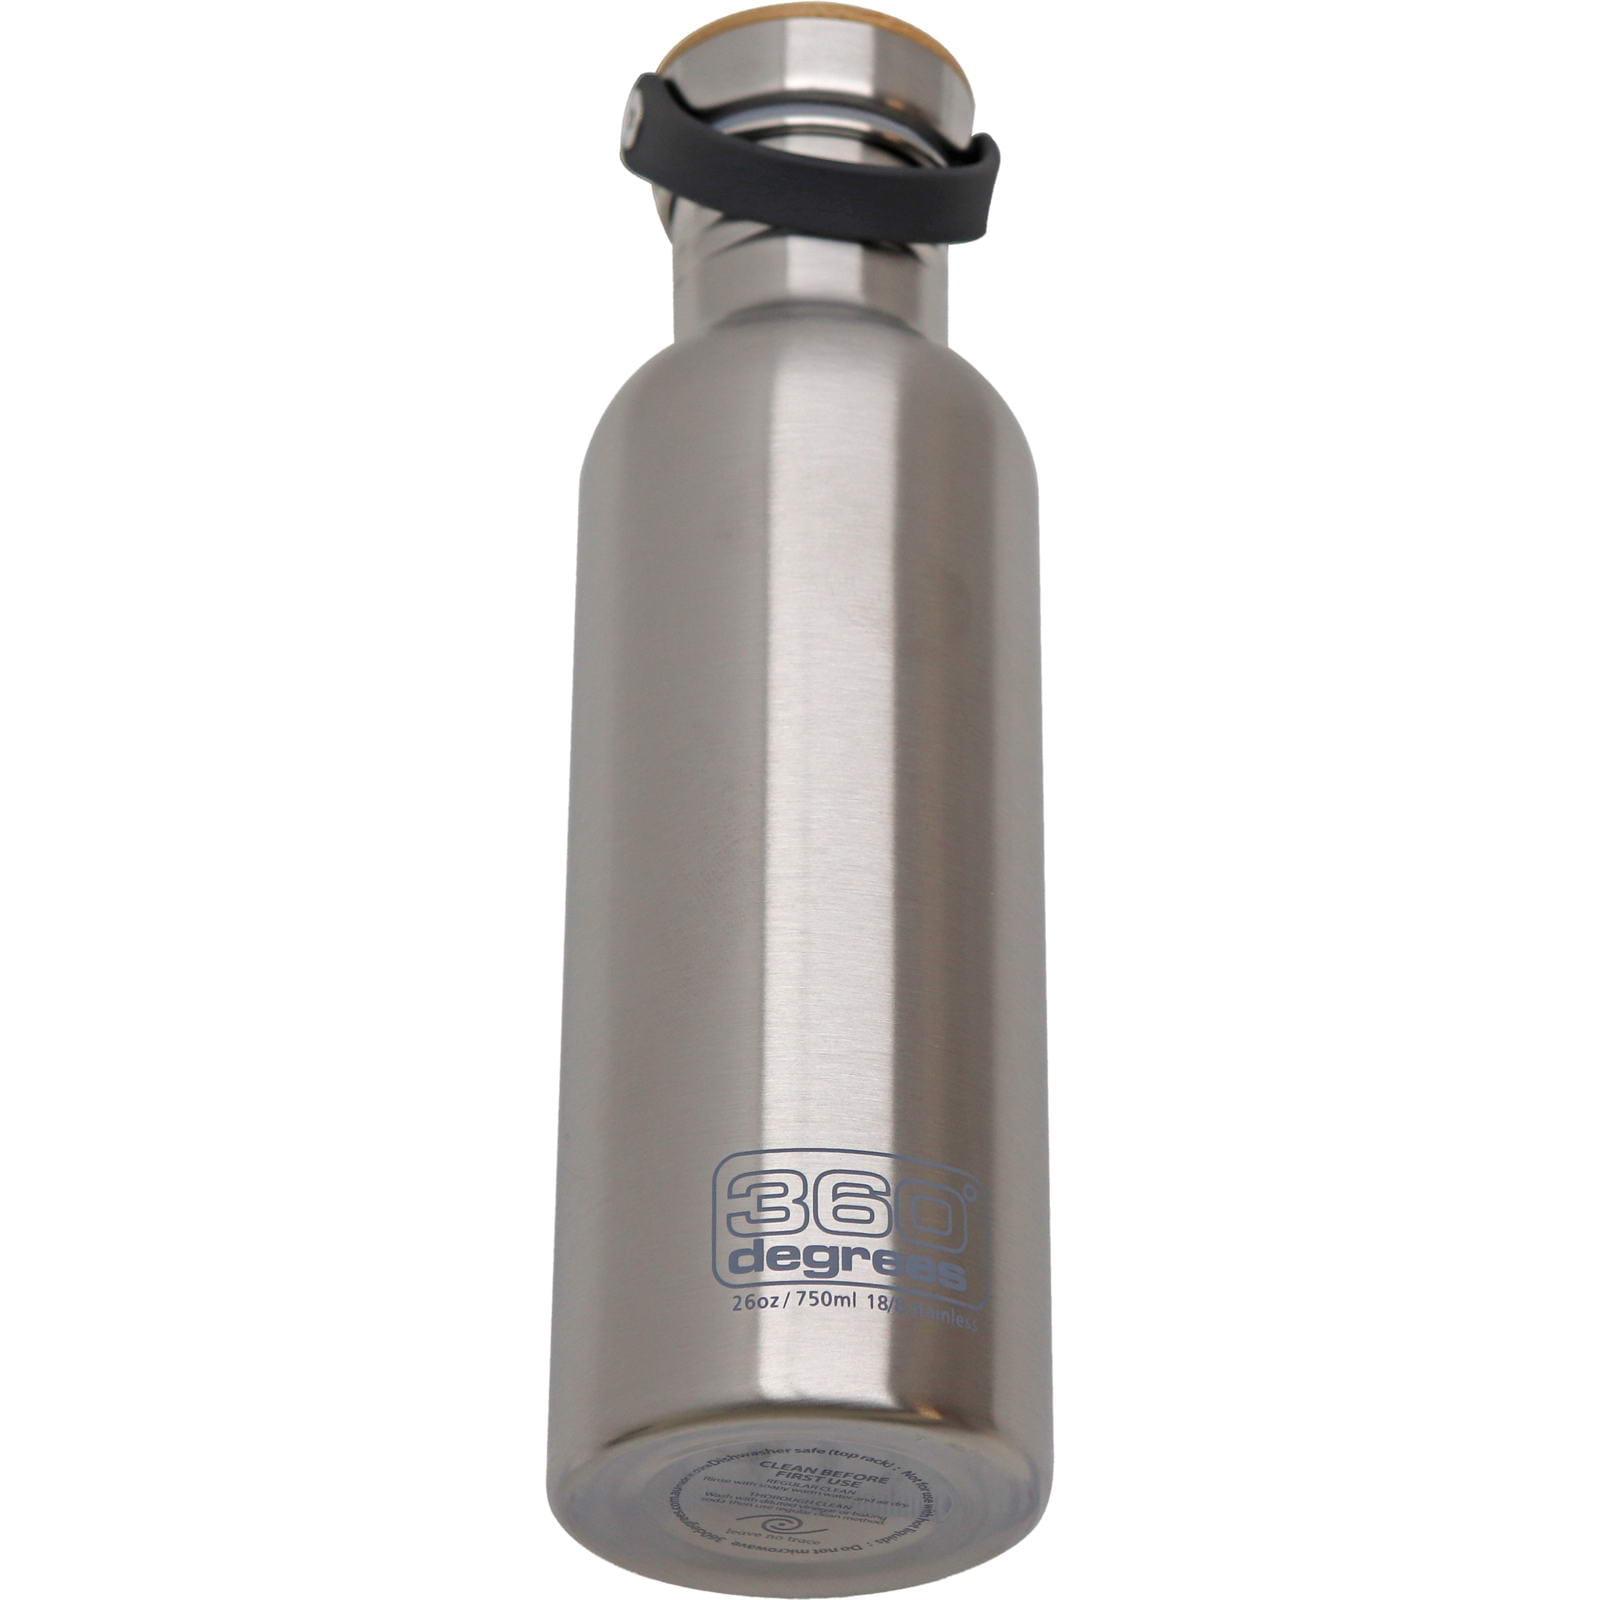 360° degrees Stainless Drink Bottle mit Bamboo Cap - 750 ml silver - Bild 2